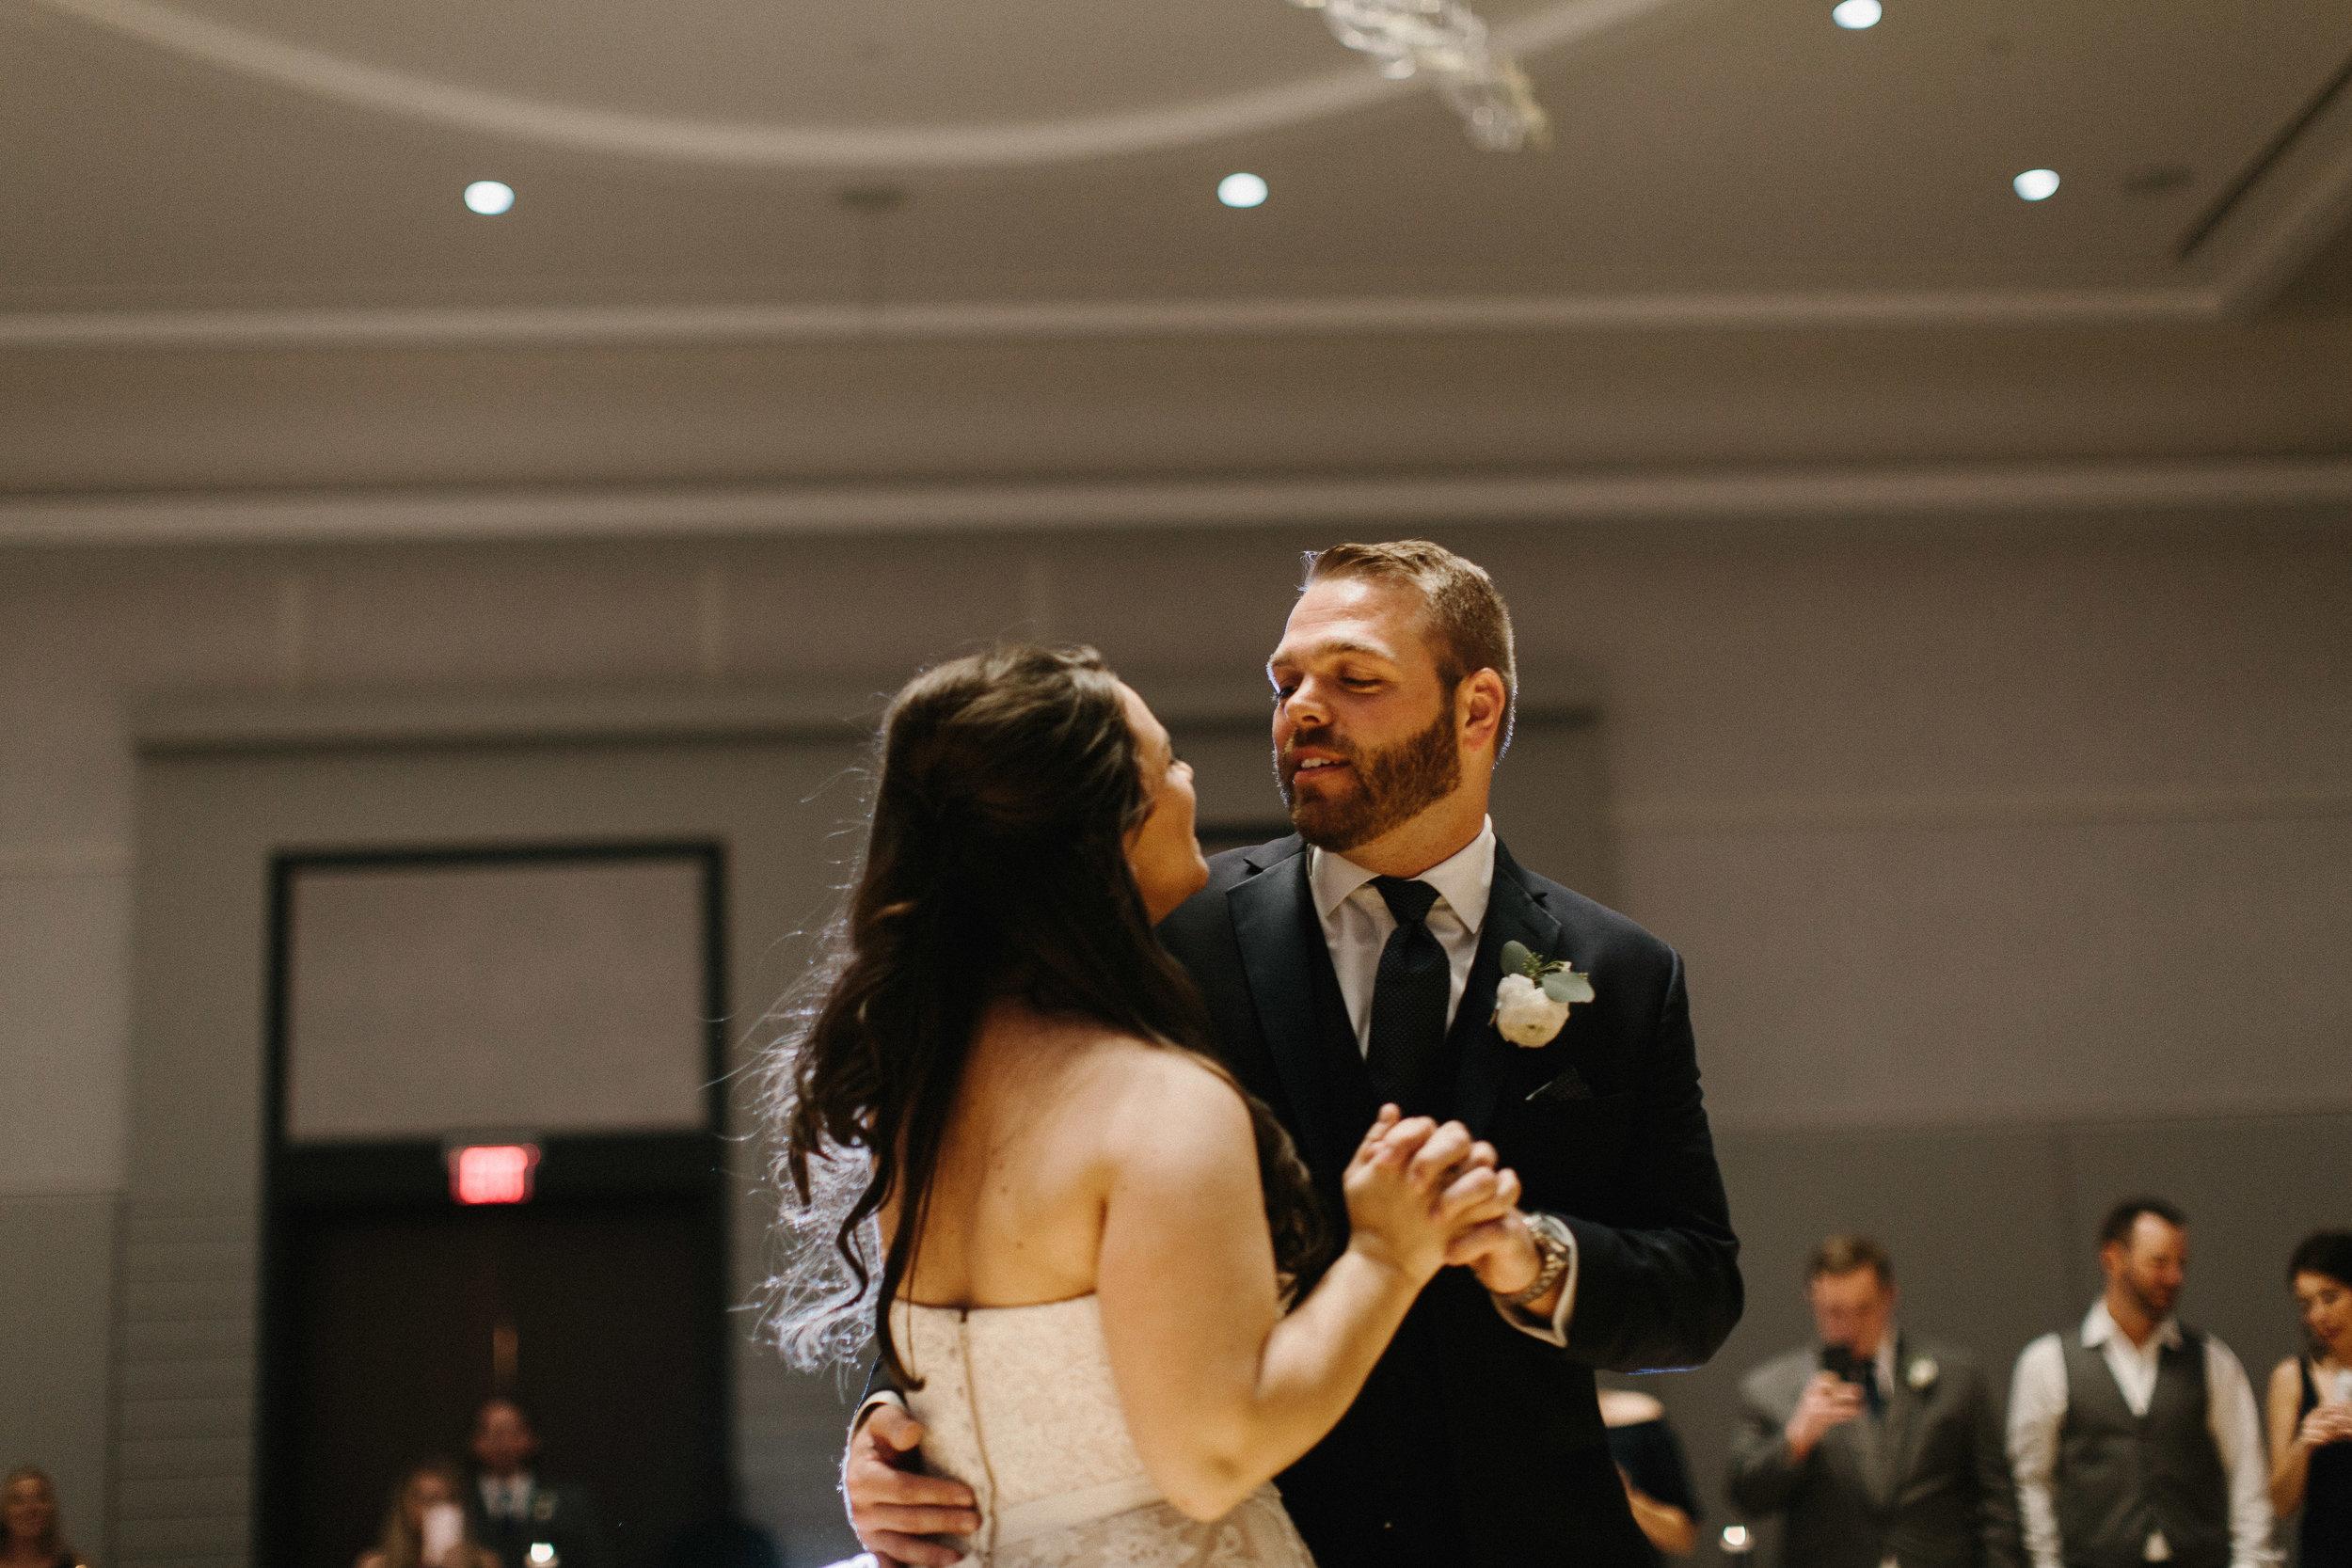 roswell_st_peter_chanel_catholic_avalon_hotel_alpharetta_wedding-2017.jpg